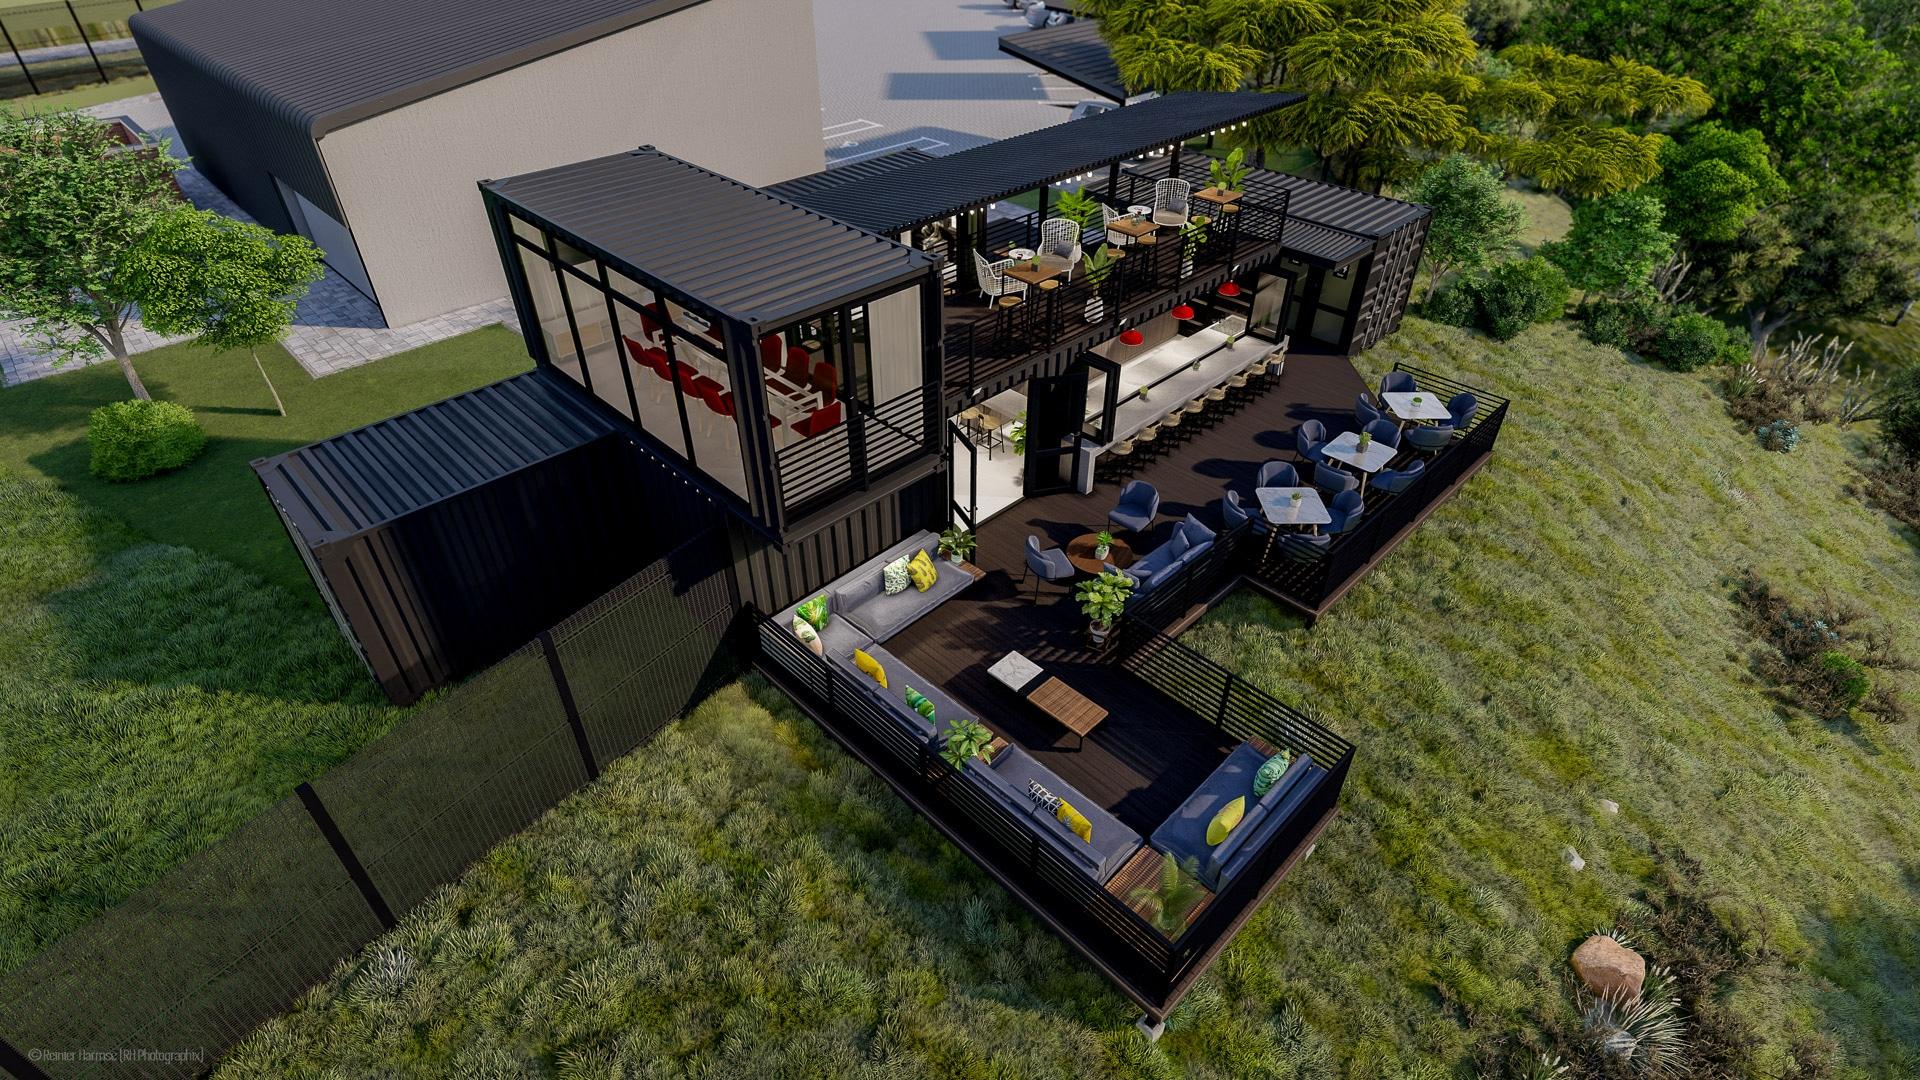 RHPX_Portfolio_LVR Container Restaurant-17